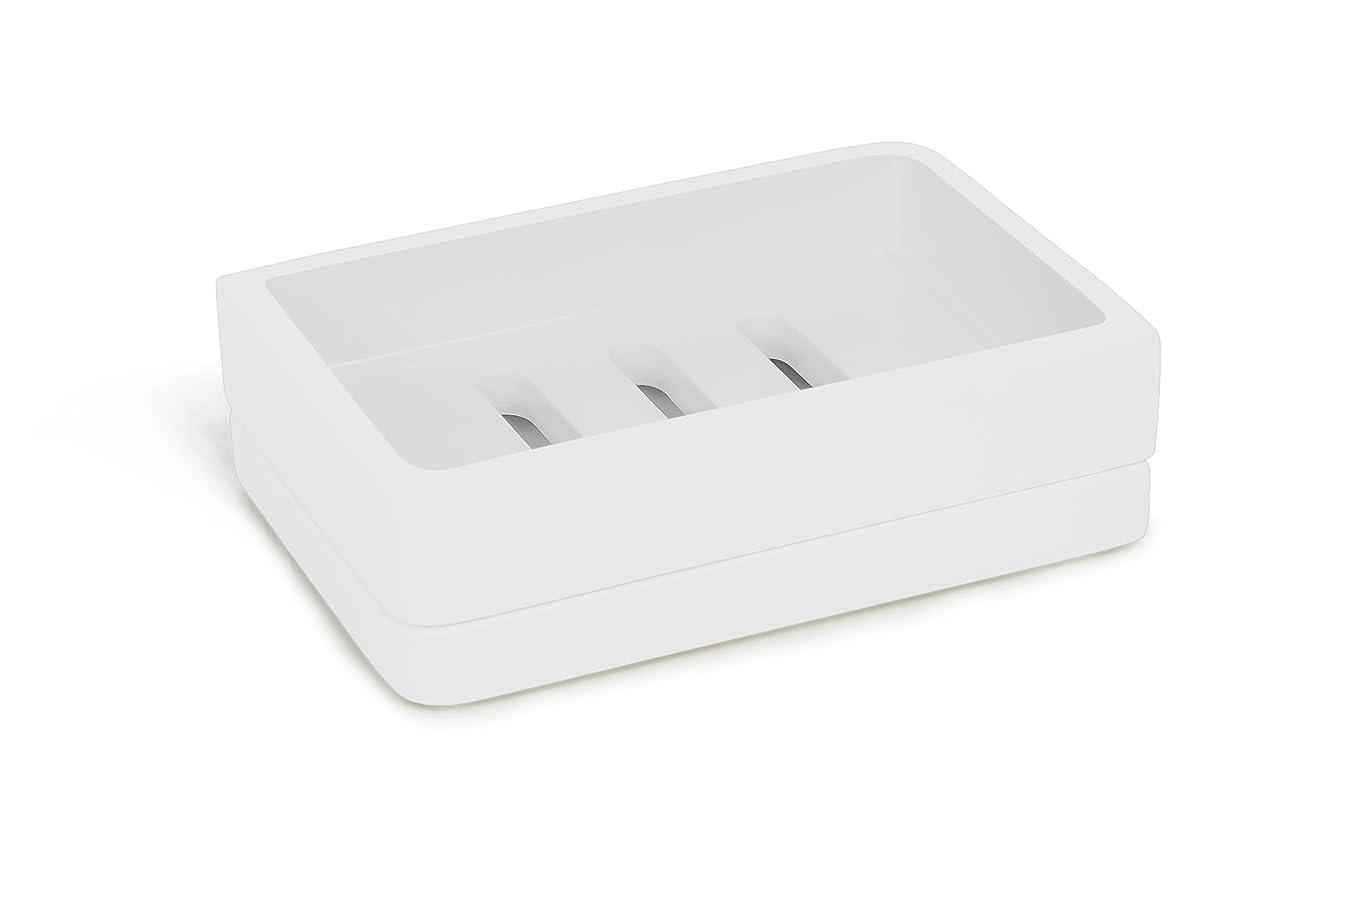 Kassatex Lacca Bath Accessories Soap Dish, White